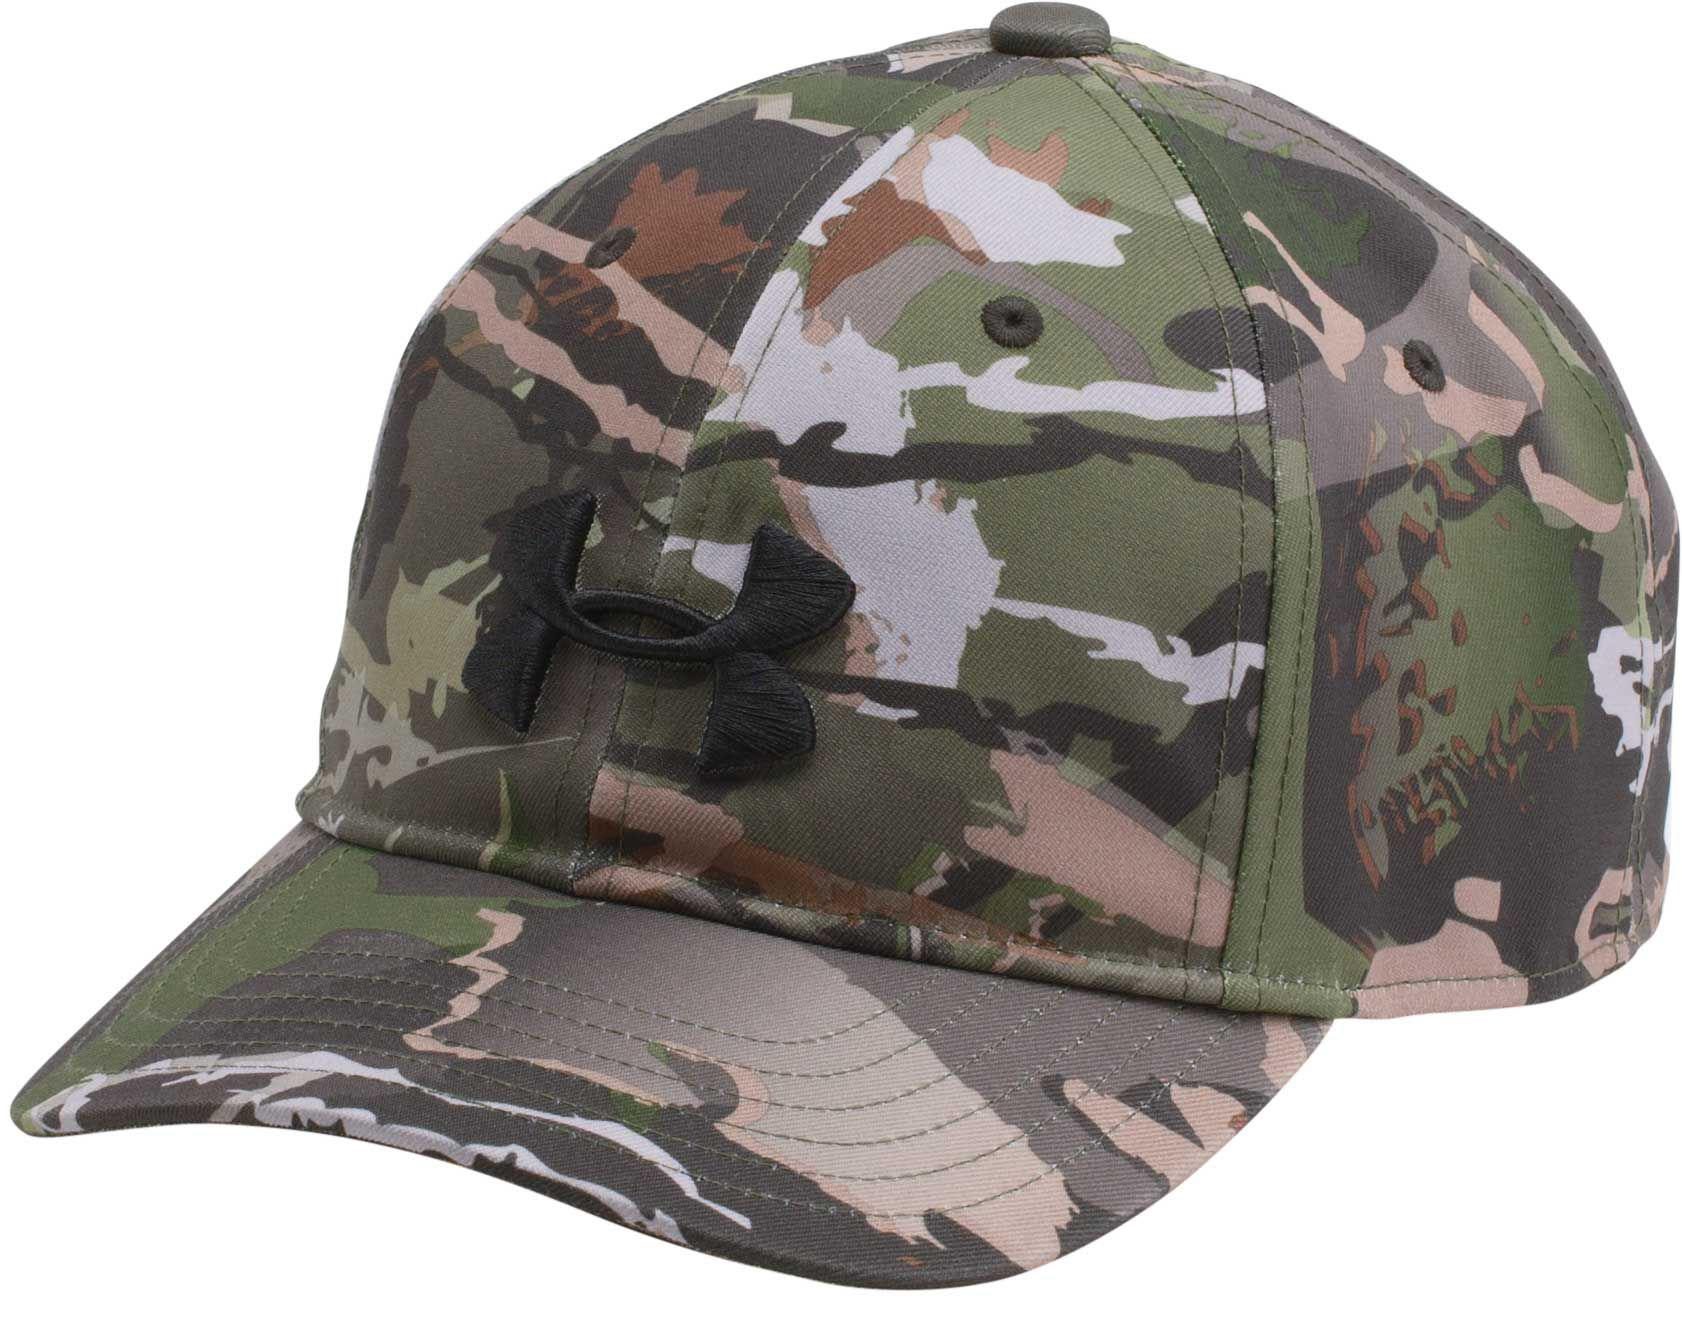 ea90e8f645a ... shopping under armour. mens gray camo cap 2.0 hunting hat 56a41 15eb2